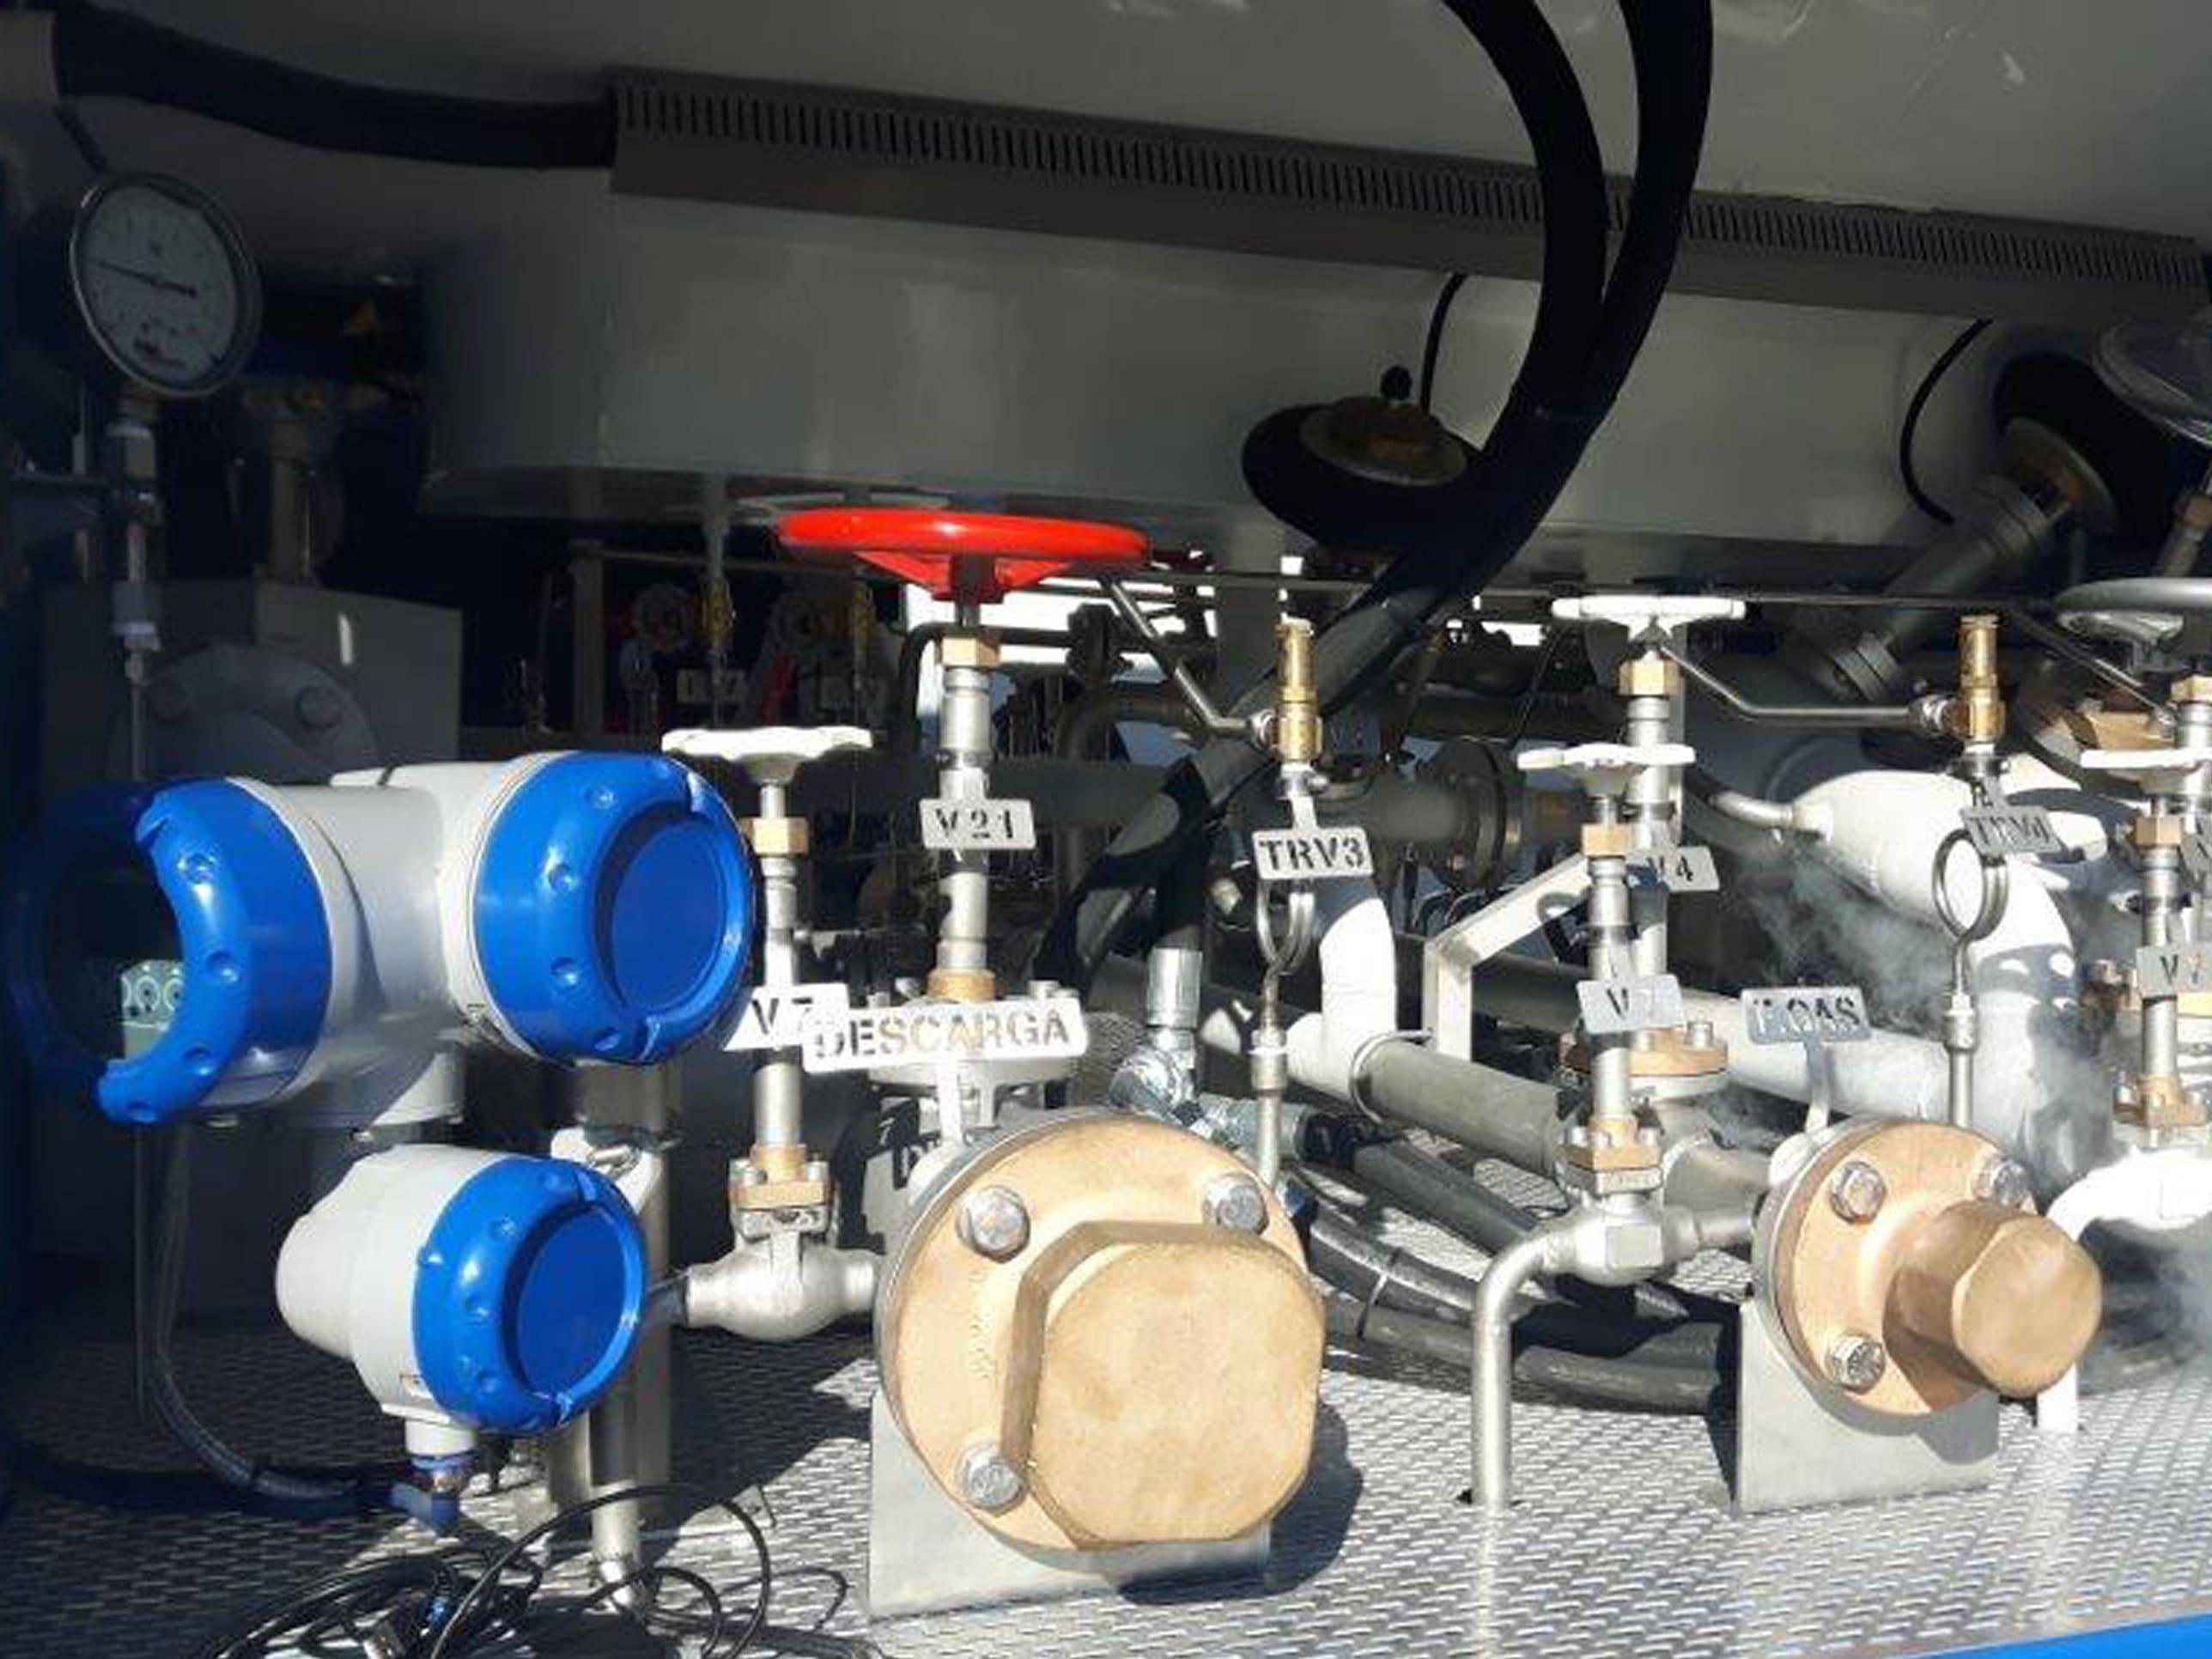 Custody transfer flow measurement for (un)loading of LNG